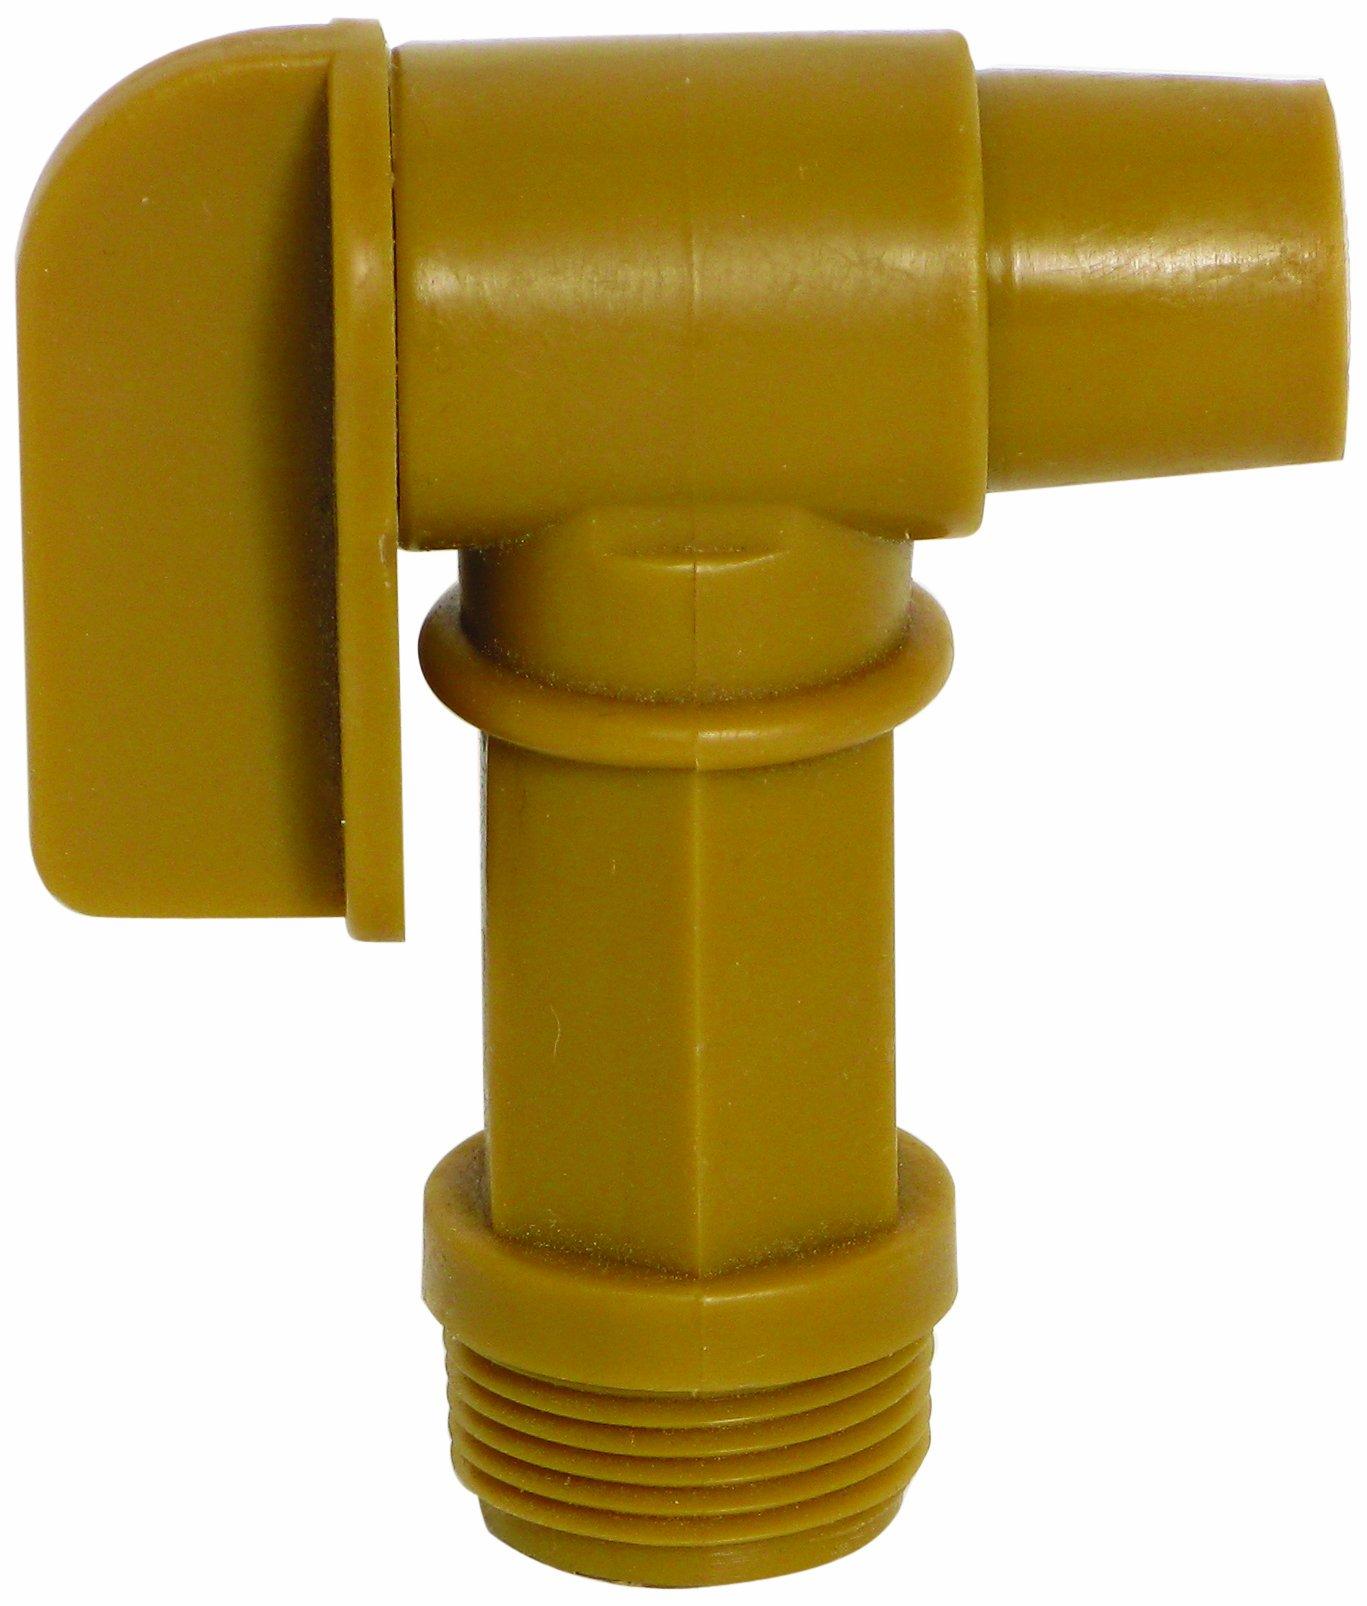 Wesco 272177 Polyethylene Drum Faucet, 0.75'' Size